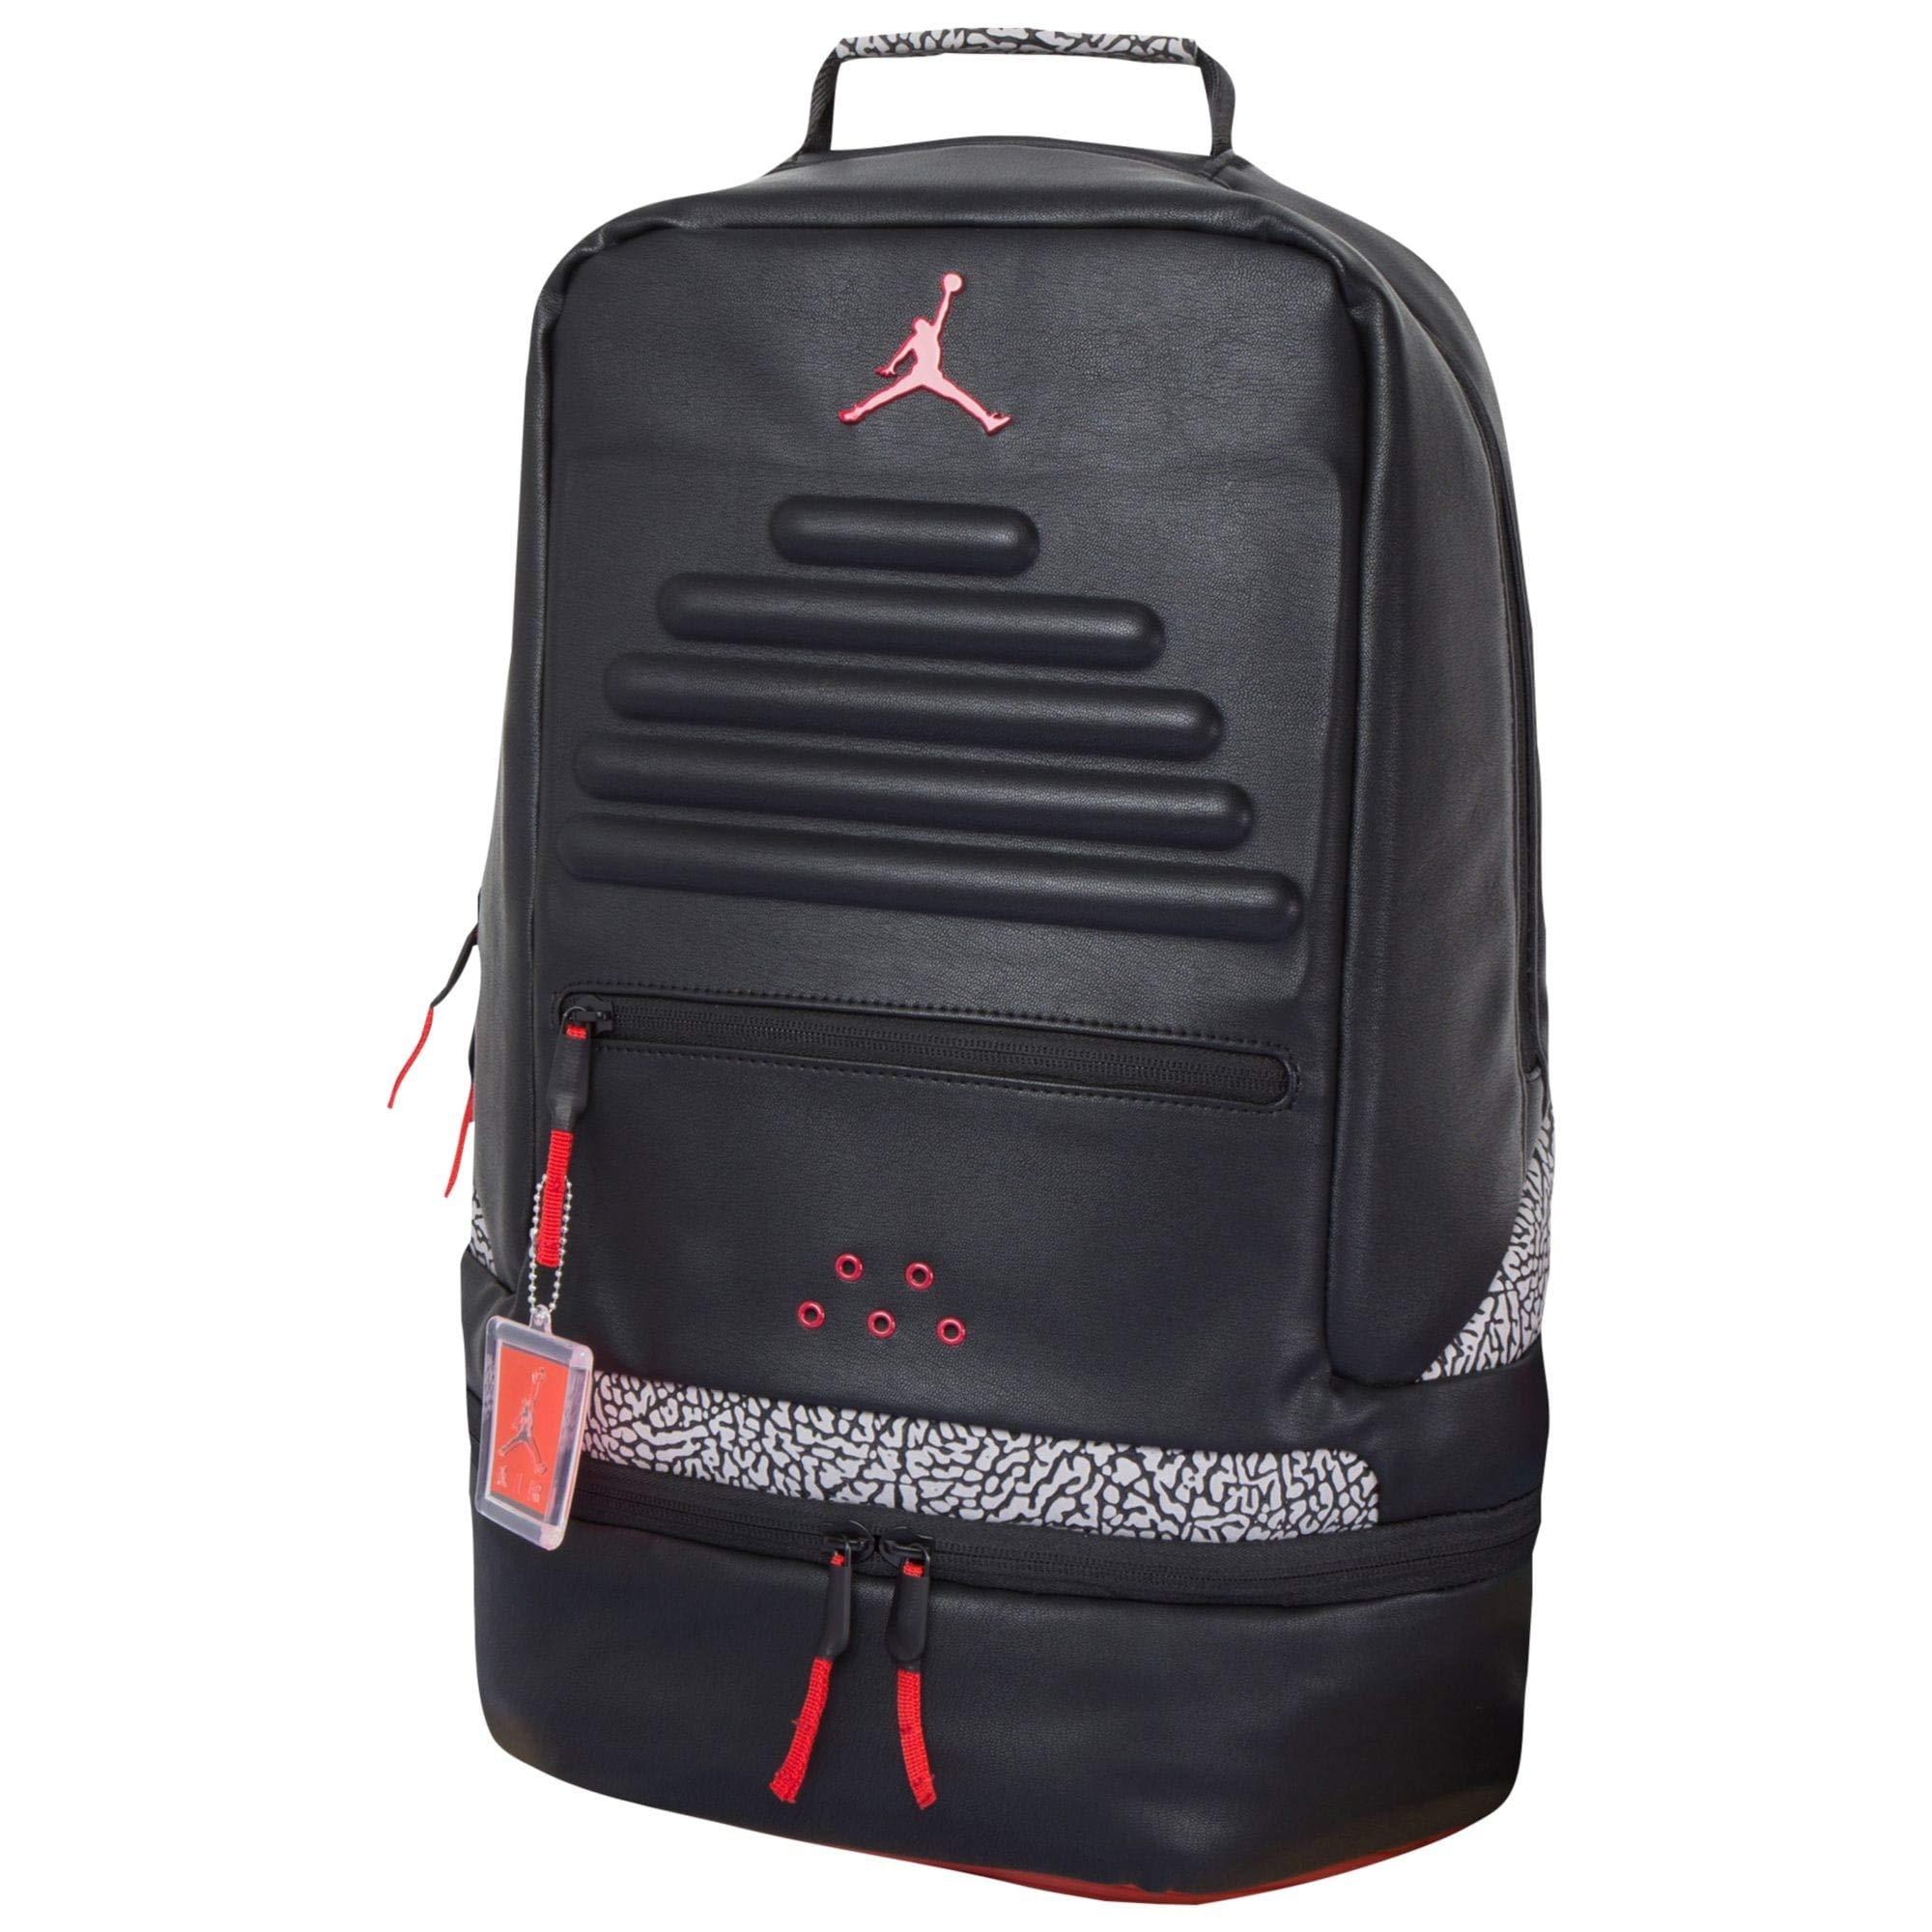 5b90634580 Galleon - Nike Air Jordan Retro 3 III Black Cement Grey Backpack Gray Red  88 9A0018 KR5